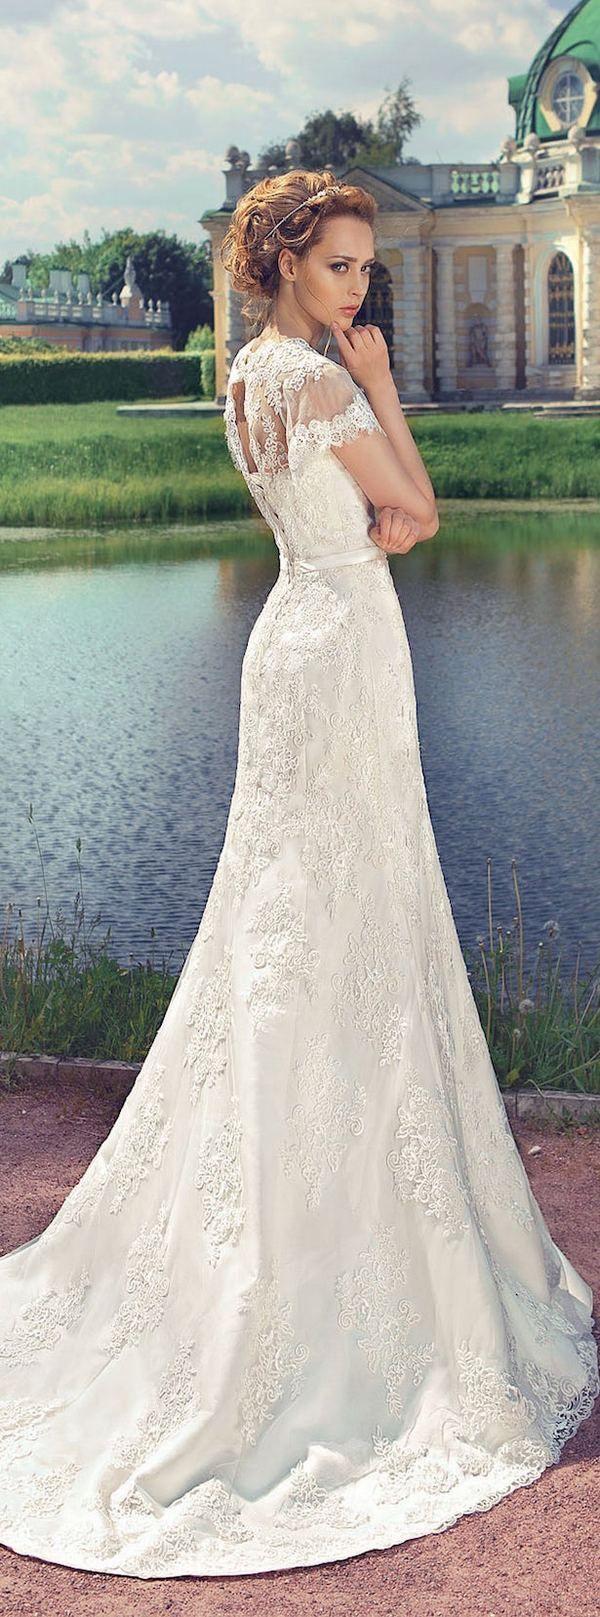 Wedding-Dresses-0634